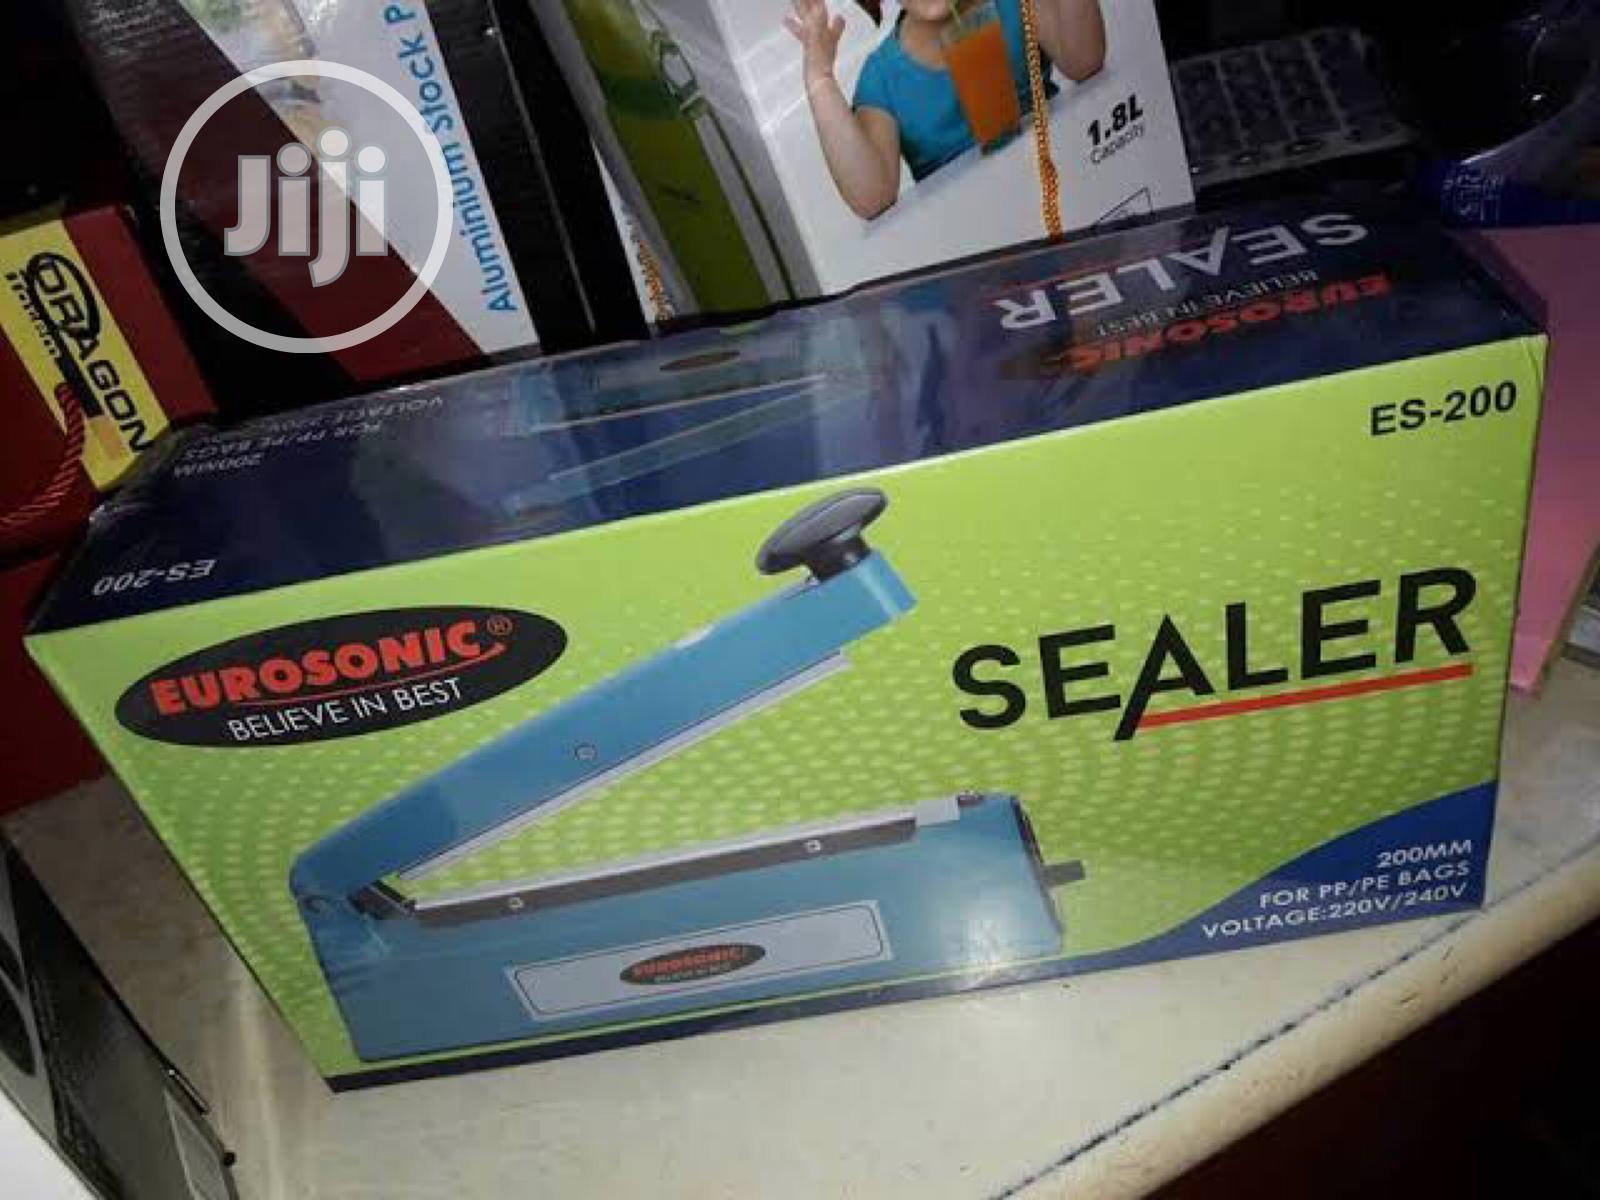 Eurosonic New Nylon Impulse Sealer Sealing Machine